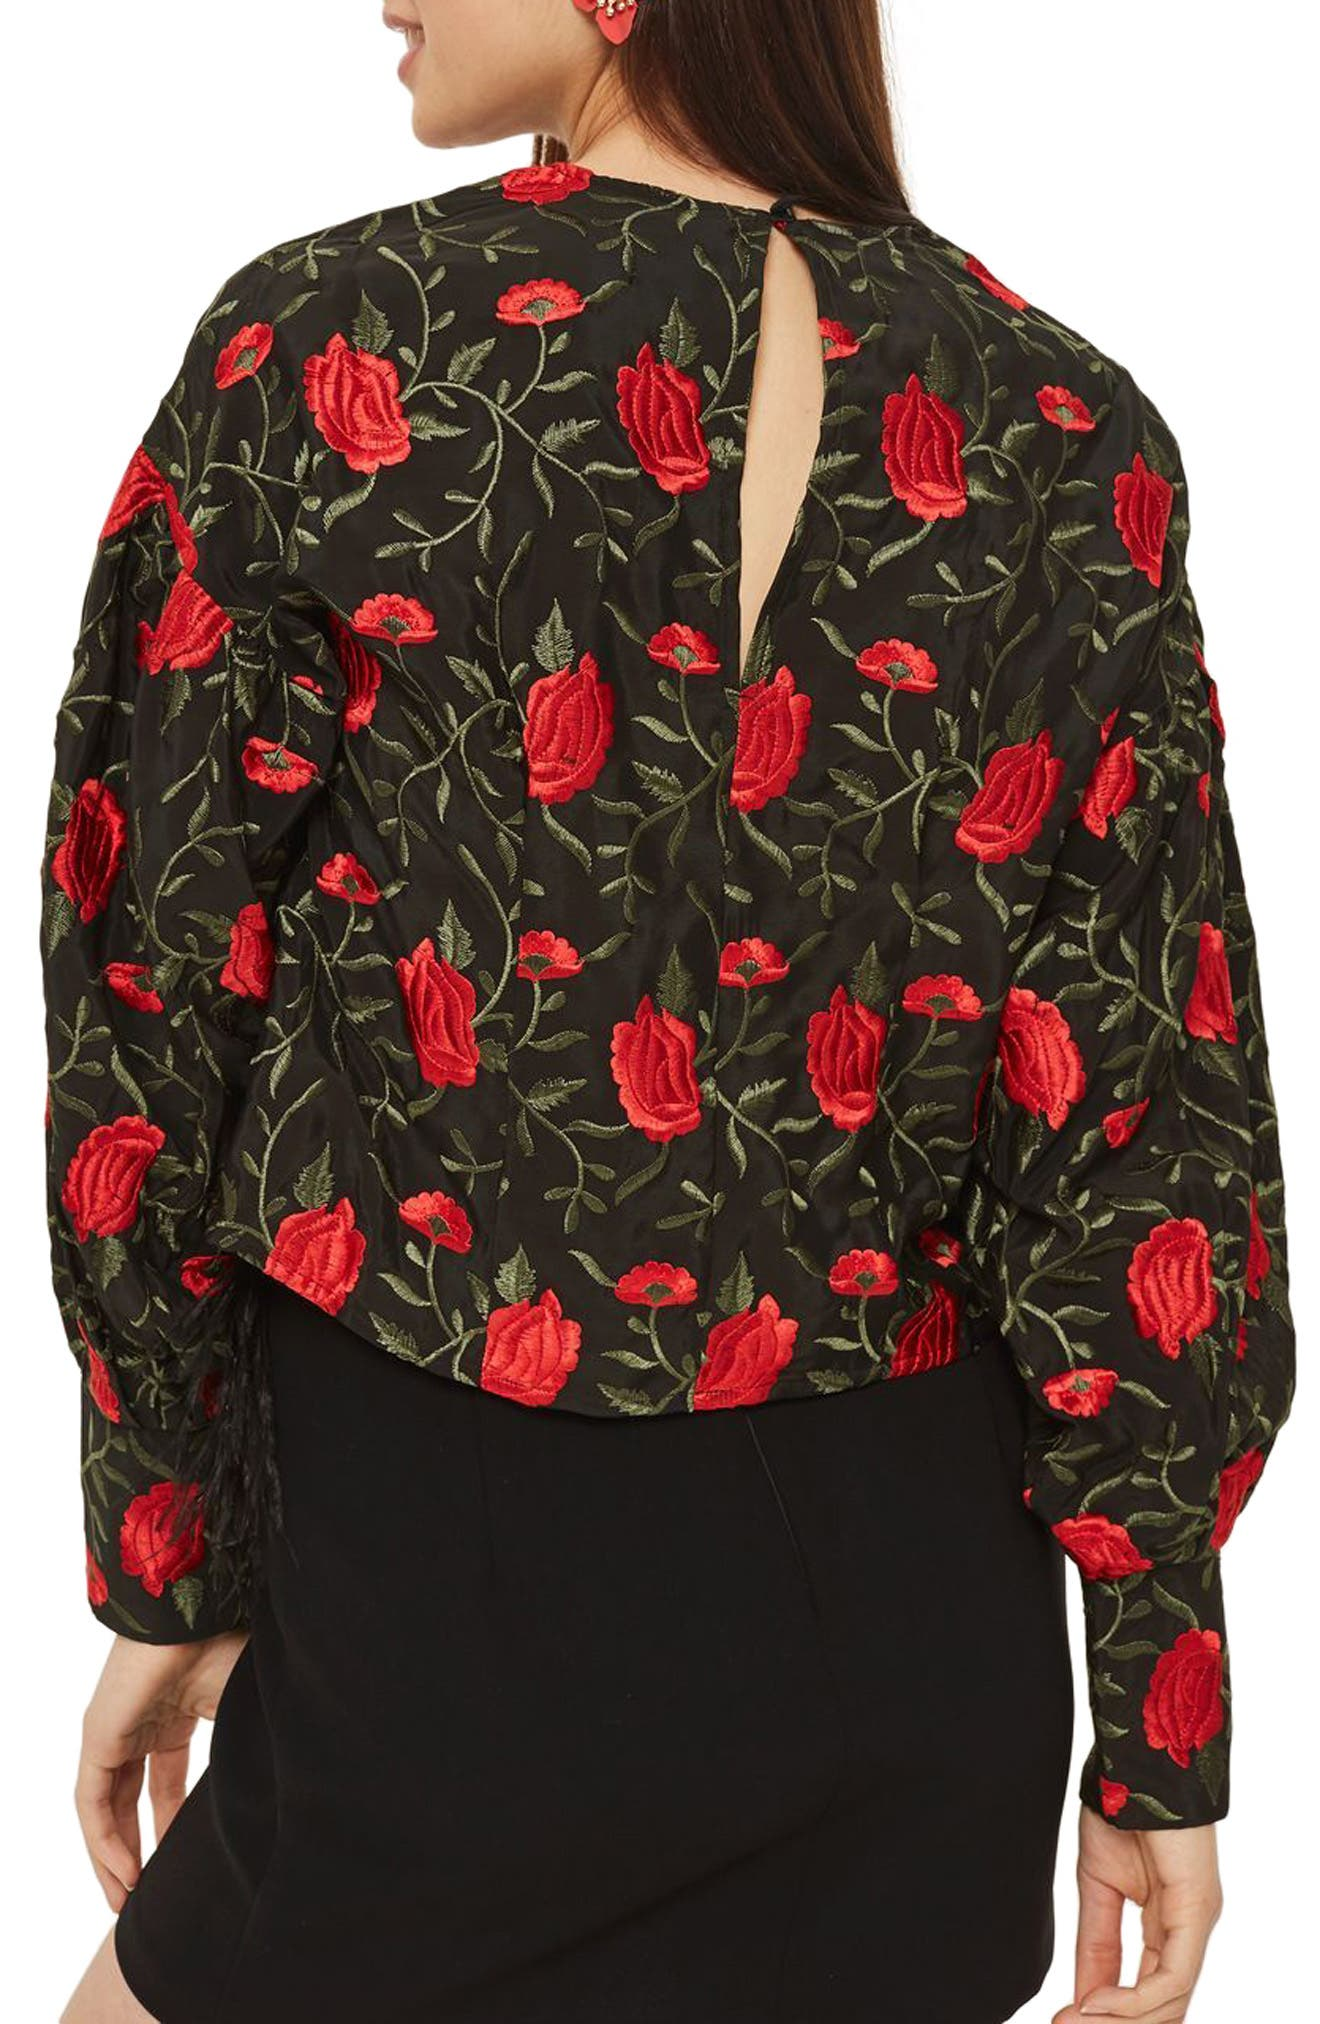 Rose Embroidered Balloon Sleeve Blouse,                             Alternate thumbnail 2, color,                             Black Multi